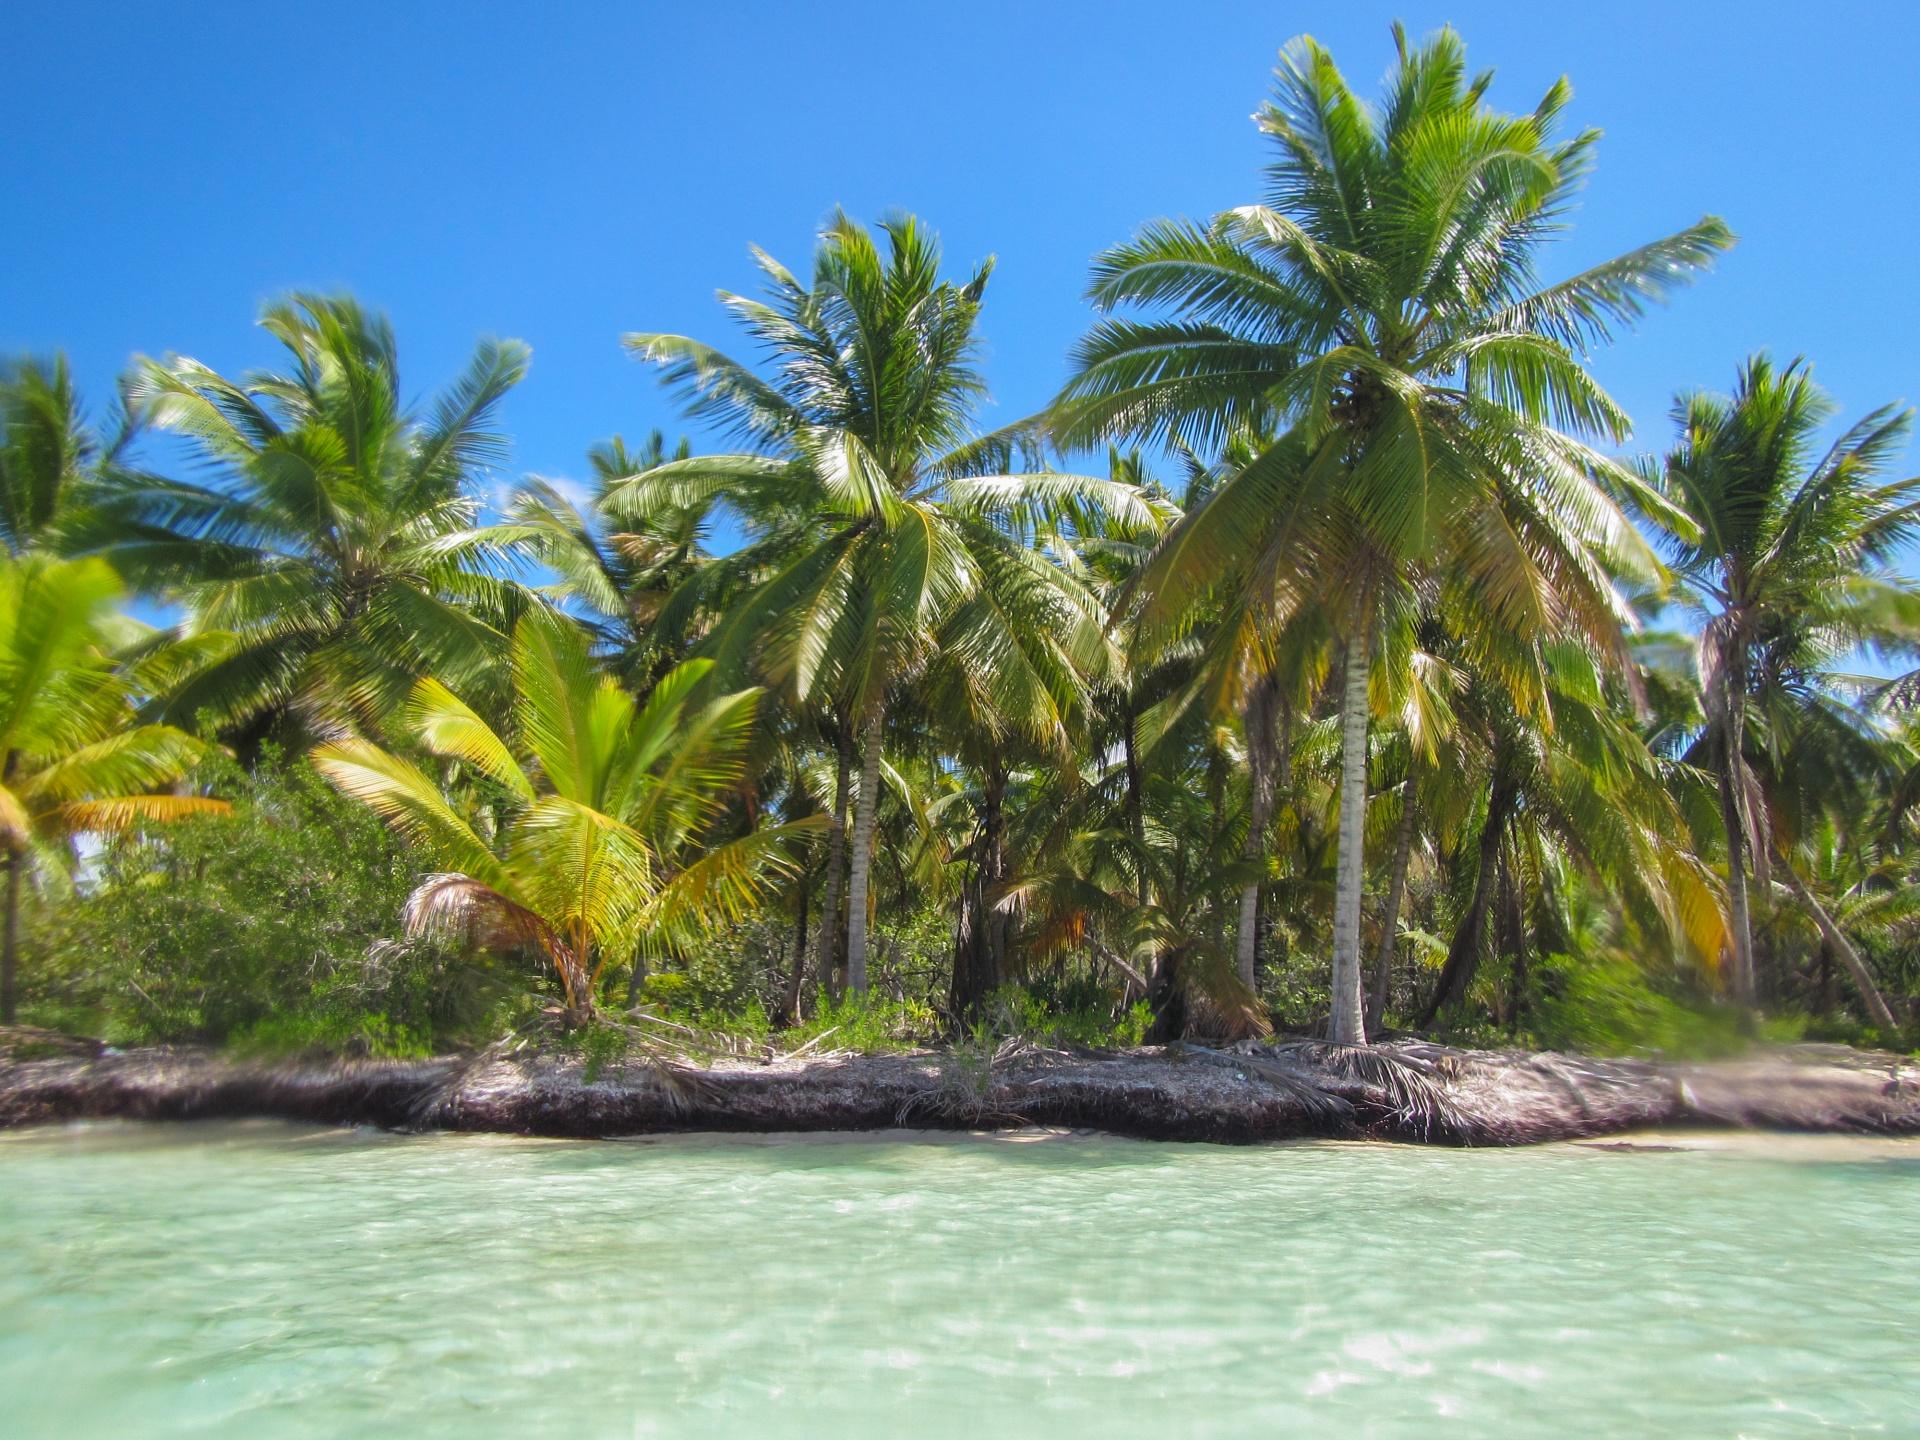 caribbean-shore-1457611821S6K